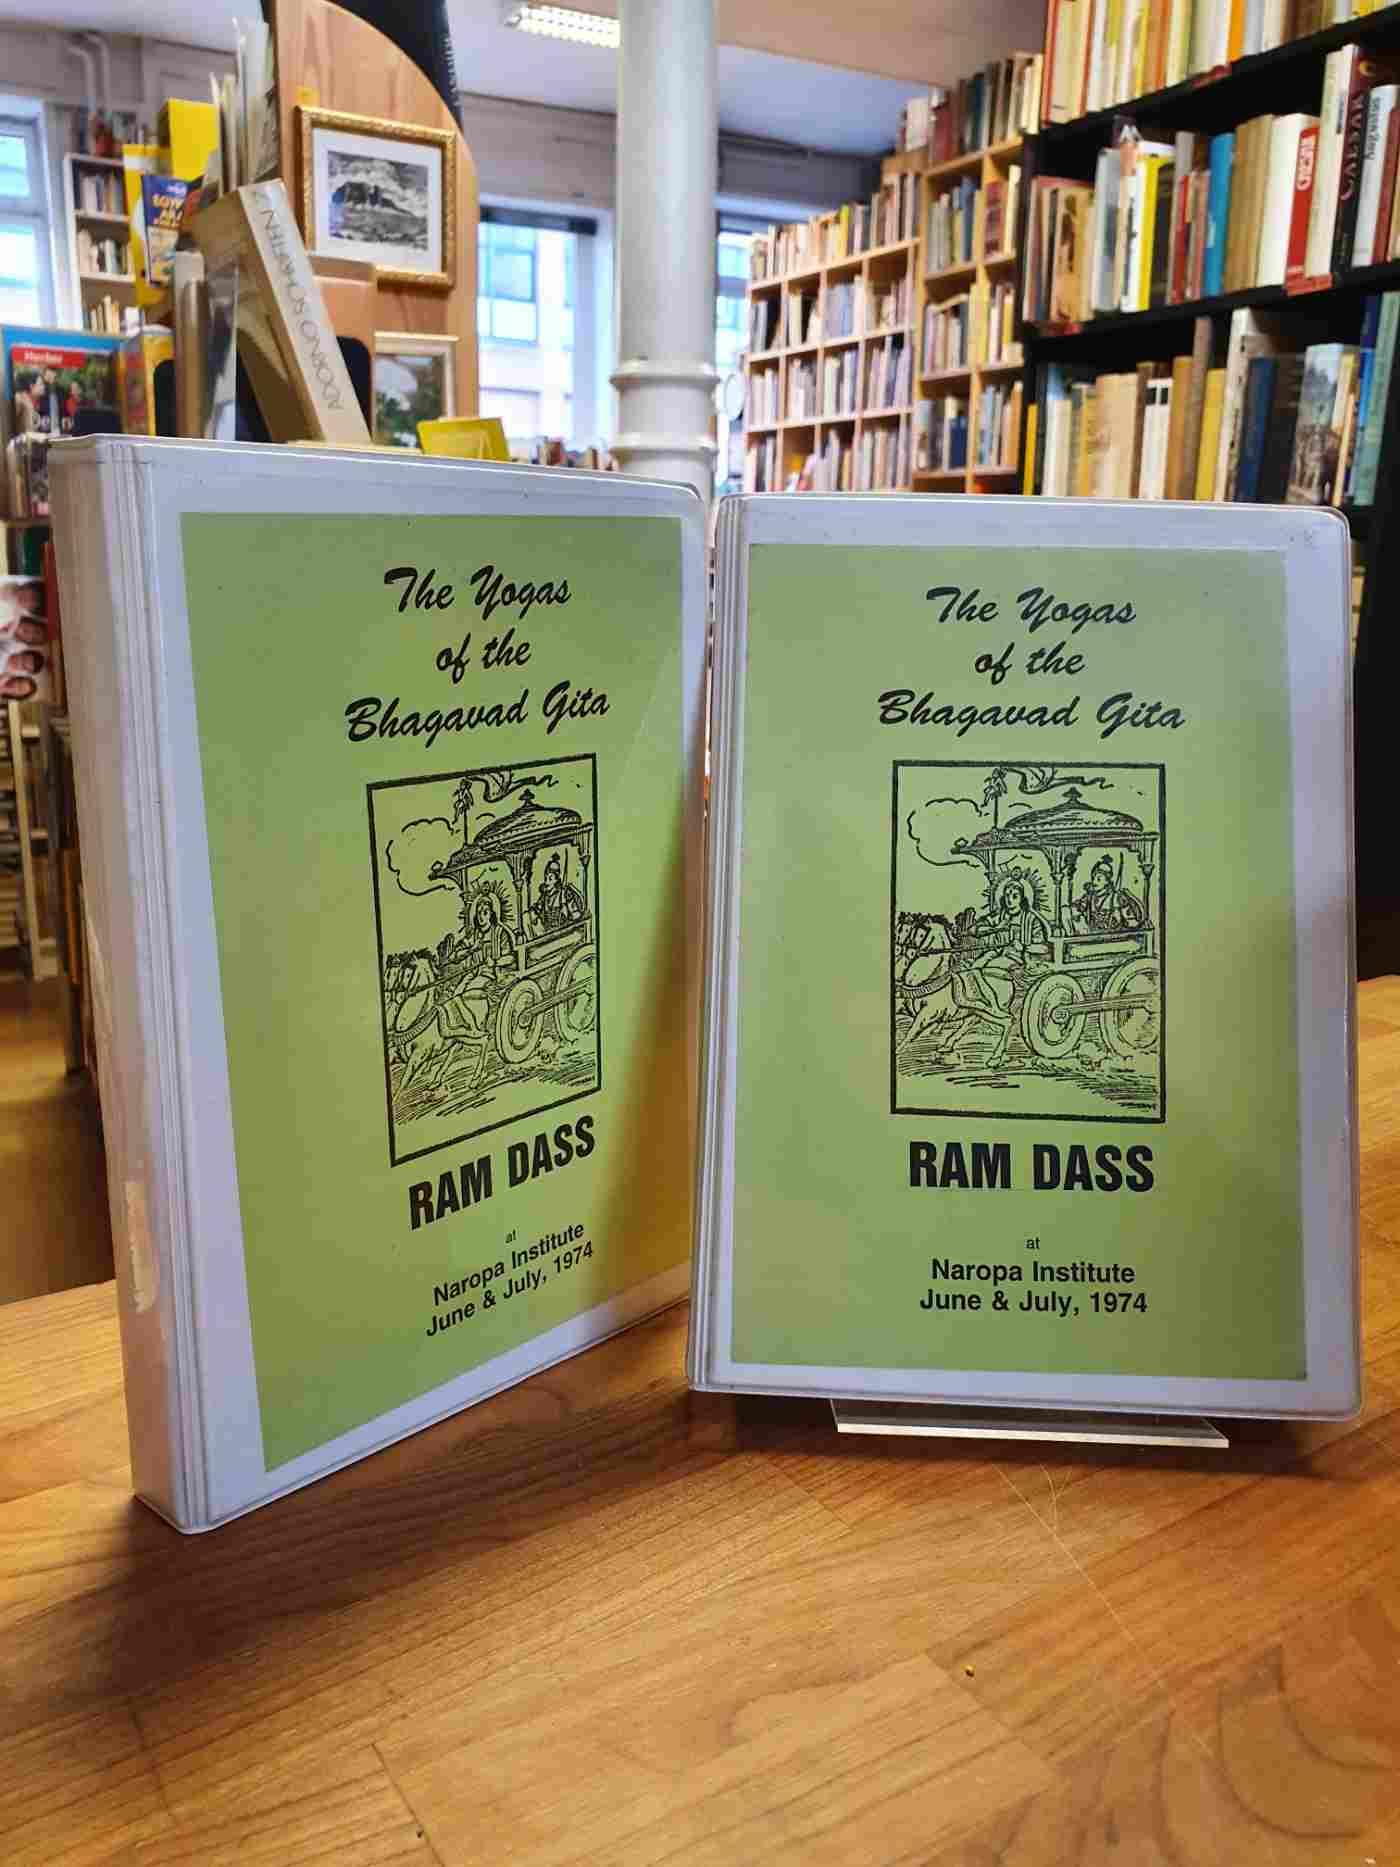 Ram Dass (das ist: Richard Alpert), The Yogas Of The Bhagavad Gita – Ram Dass At